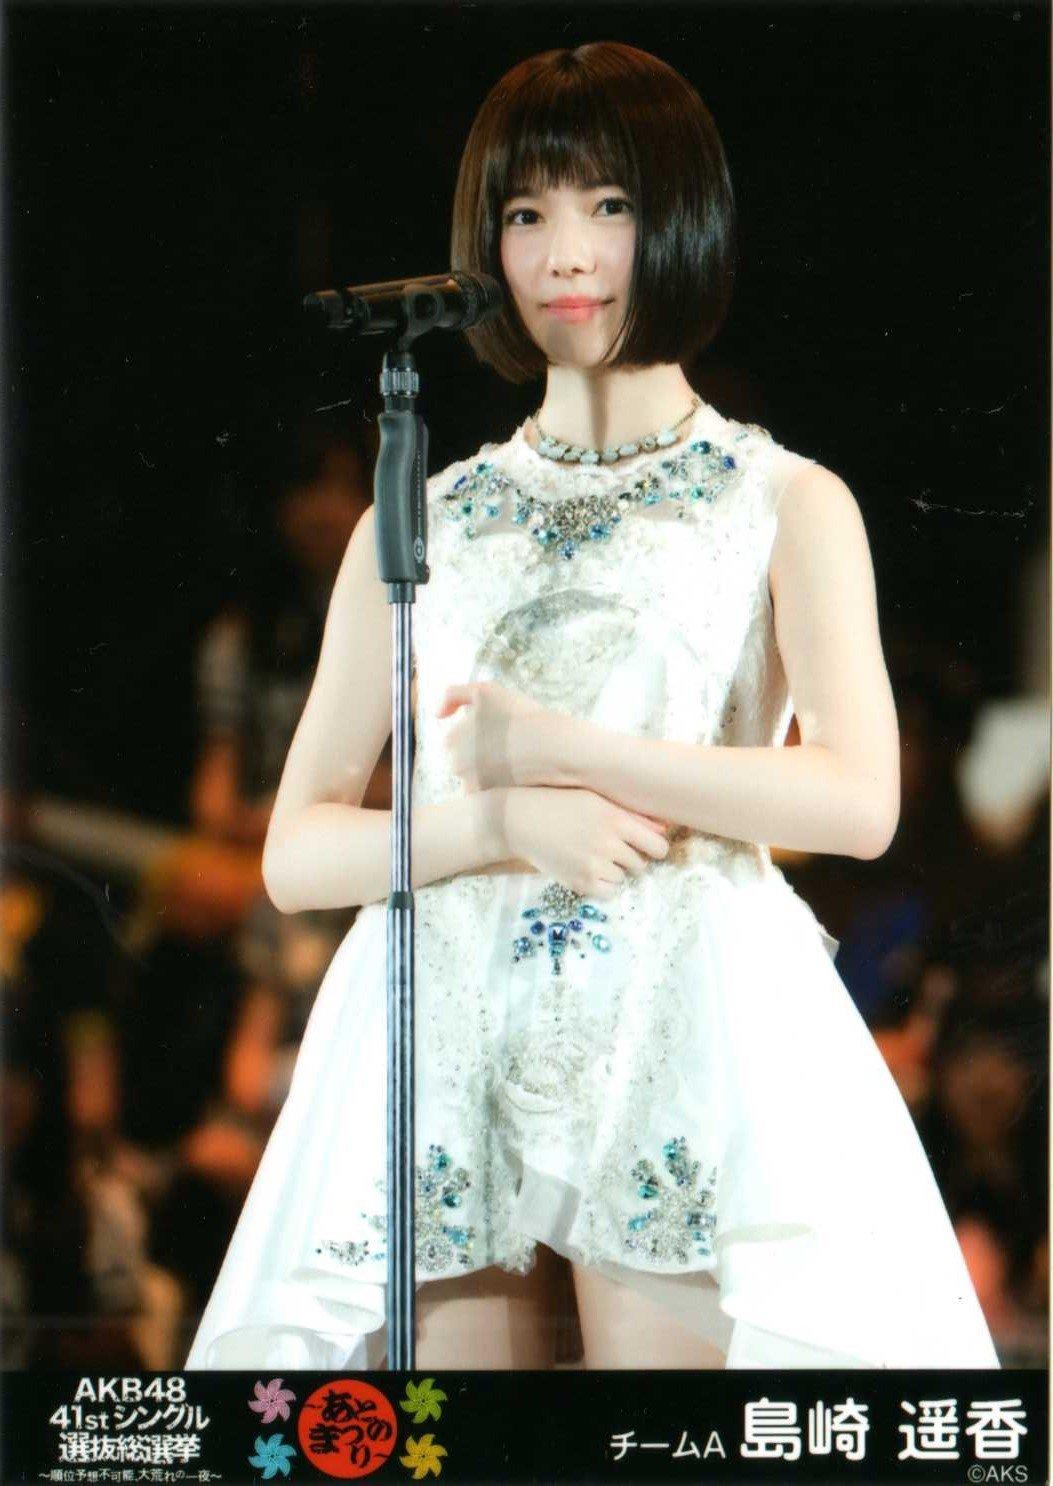 AKB48 41stシングル 選抜総選挙~順位予想不可能、大荒れの一夜~&後夜祭~あとのまつり AKB48グループショップ  限定特典 生写真 島崎 遥香   B01587003G